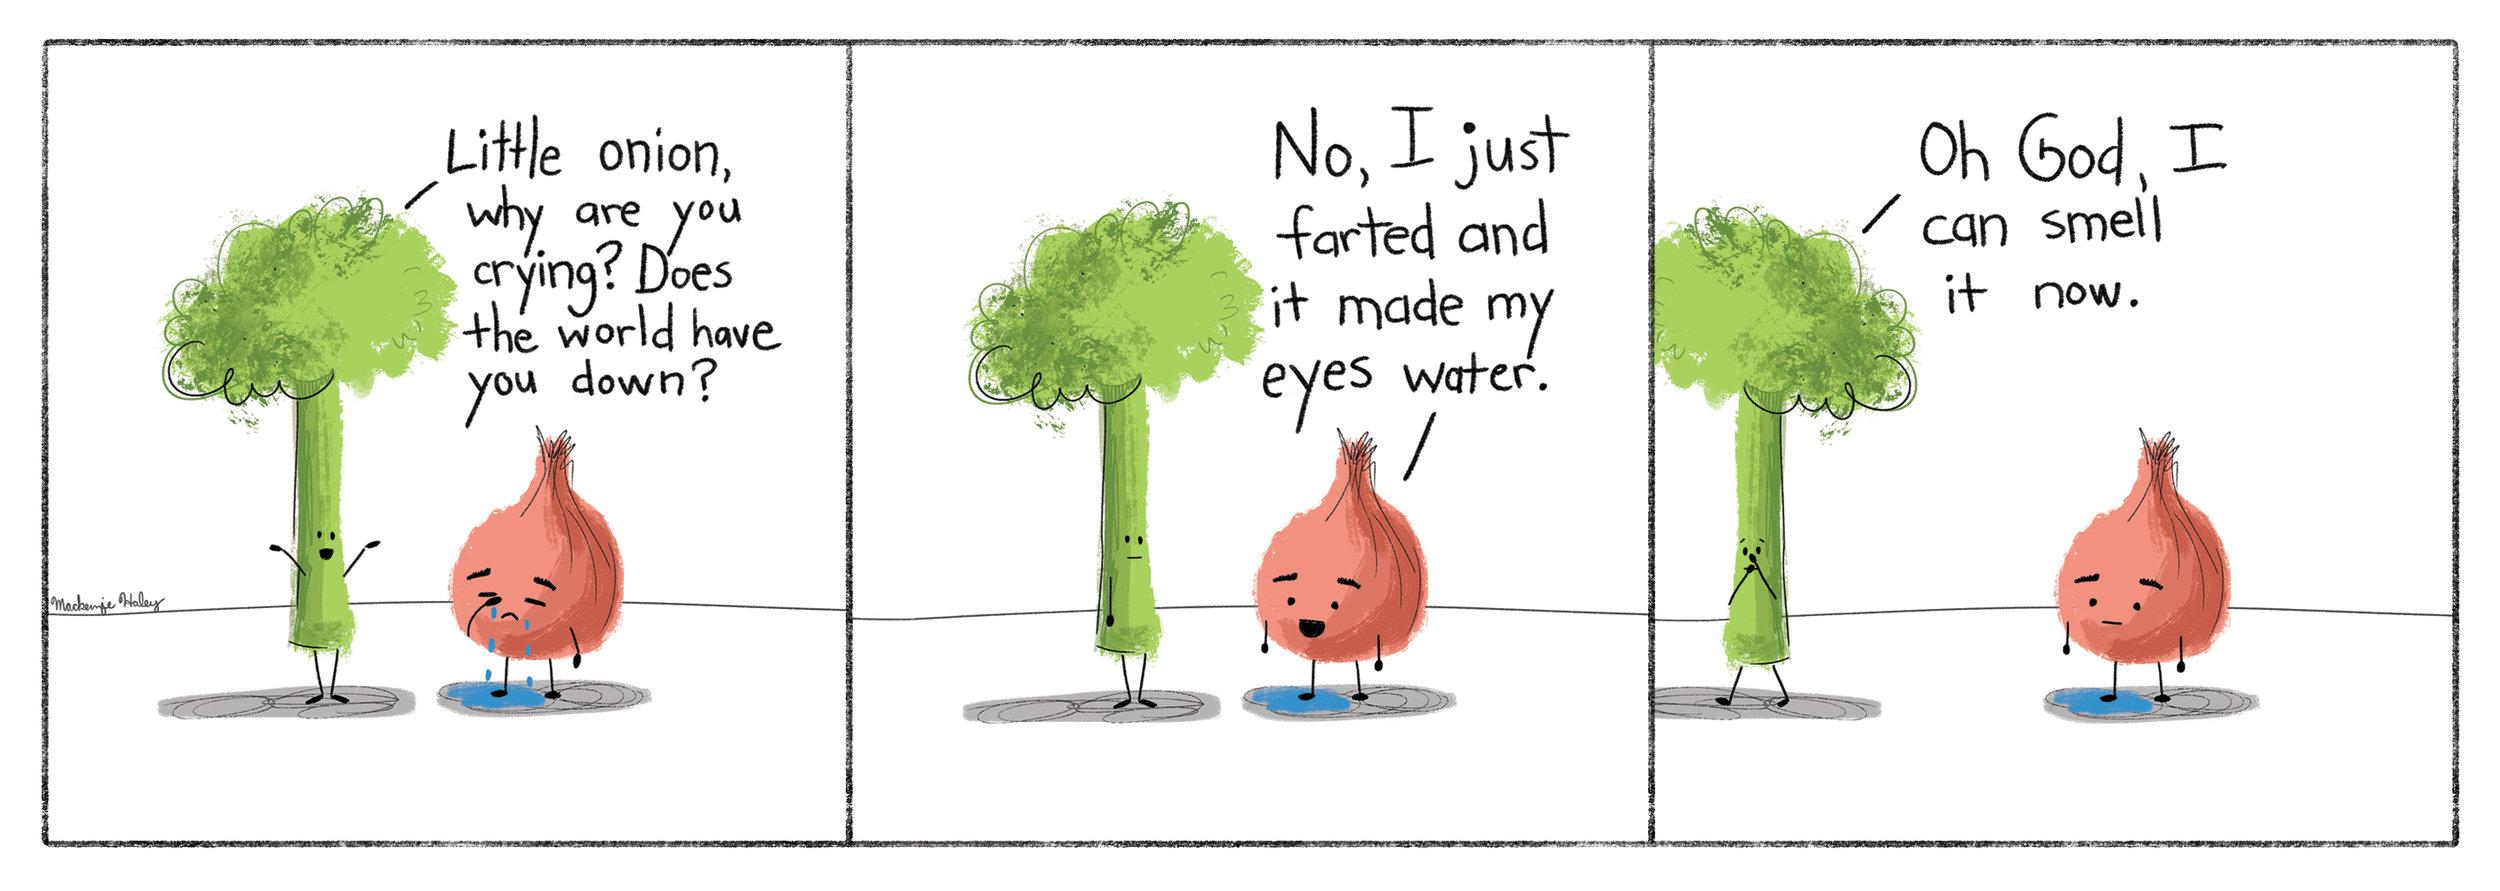 onion comic.jpg